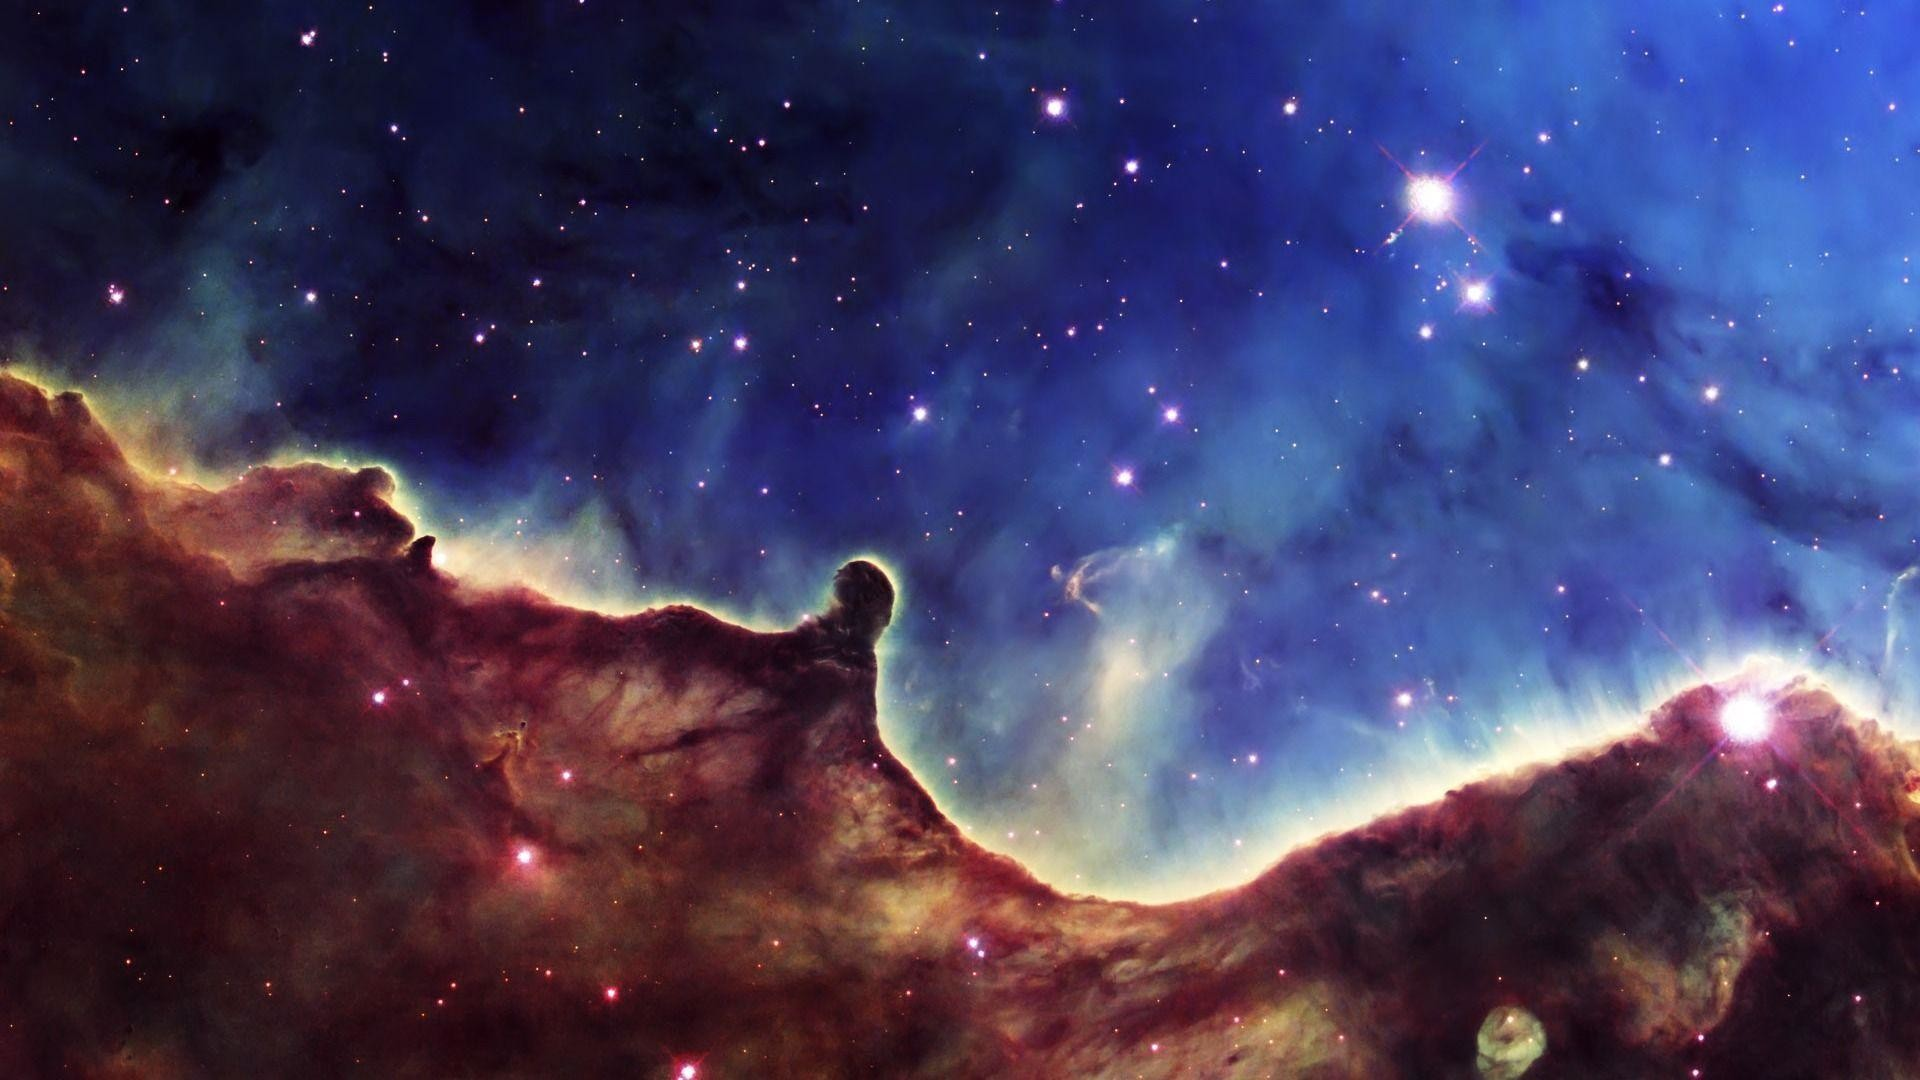 Hubble Star Wallpaper (3) #8 – Wallpaper Download .